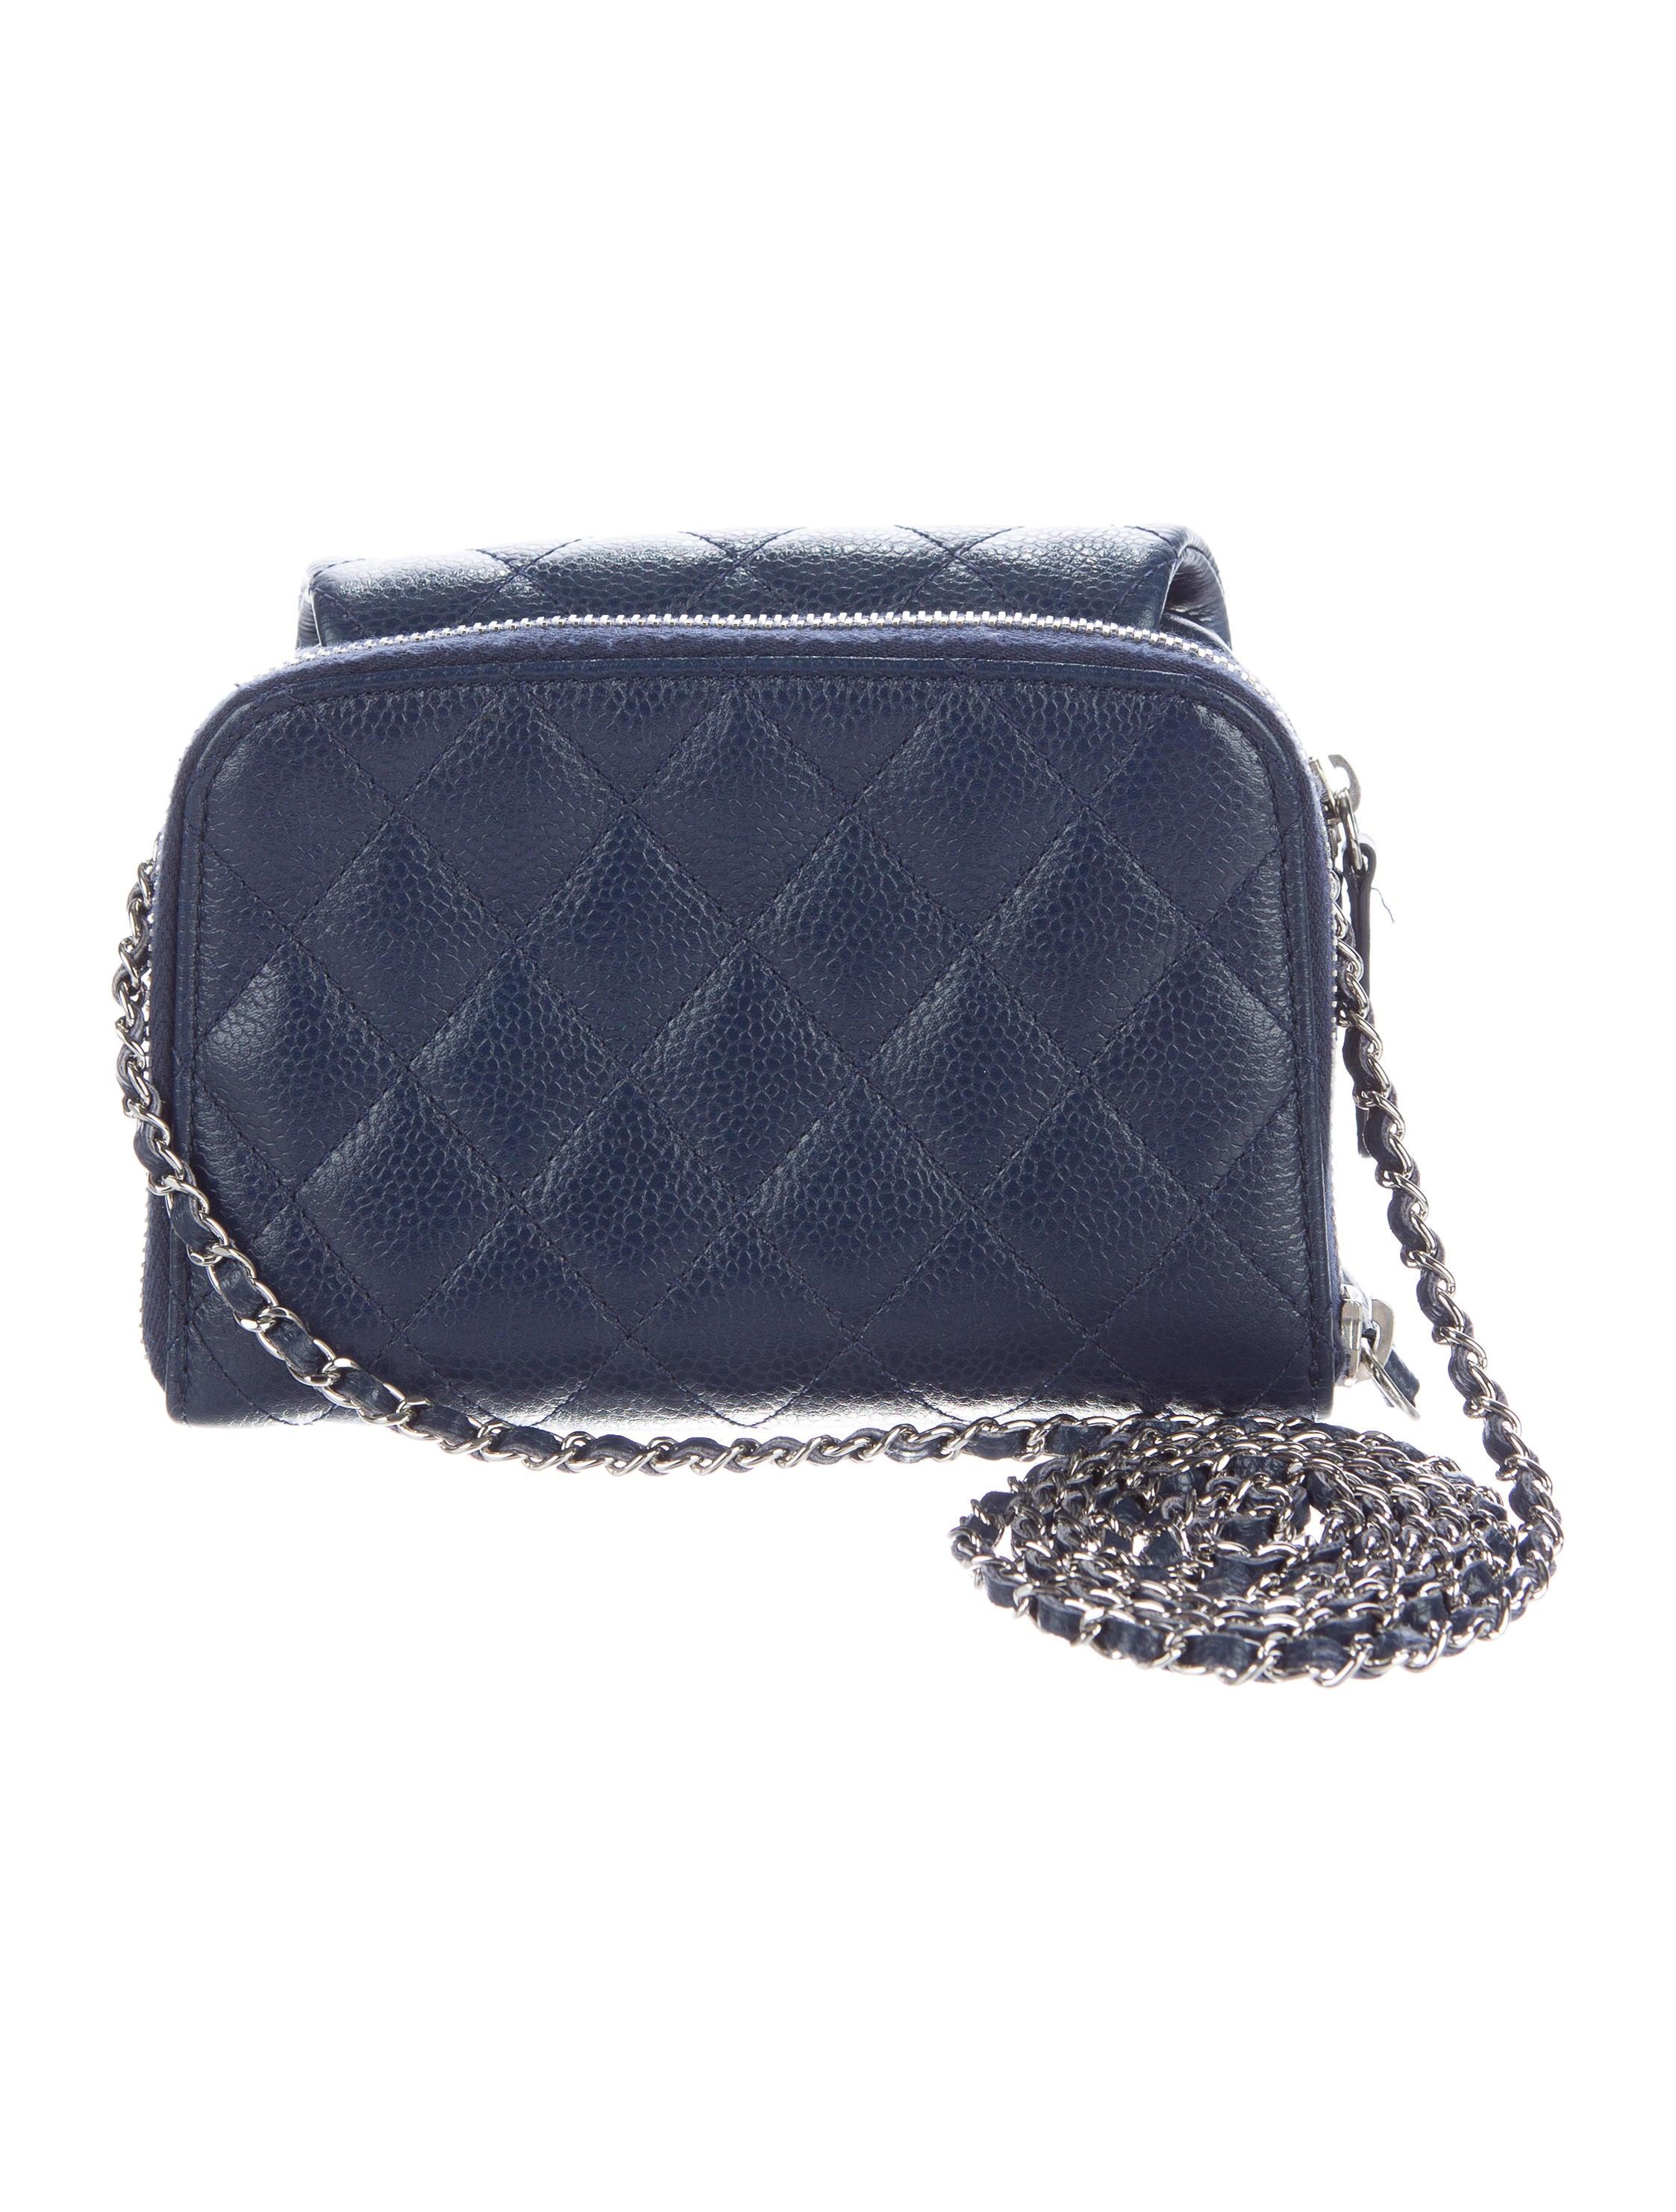 fdddd9cc9f40 Chanel Mini Wallet Caviar | Stanford Center for Opportunity Policy ...